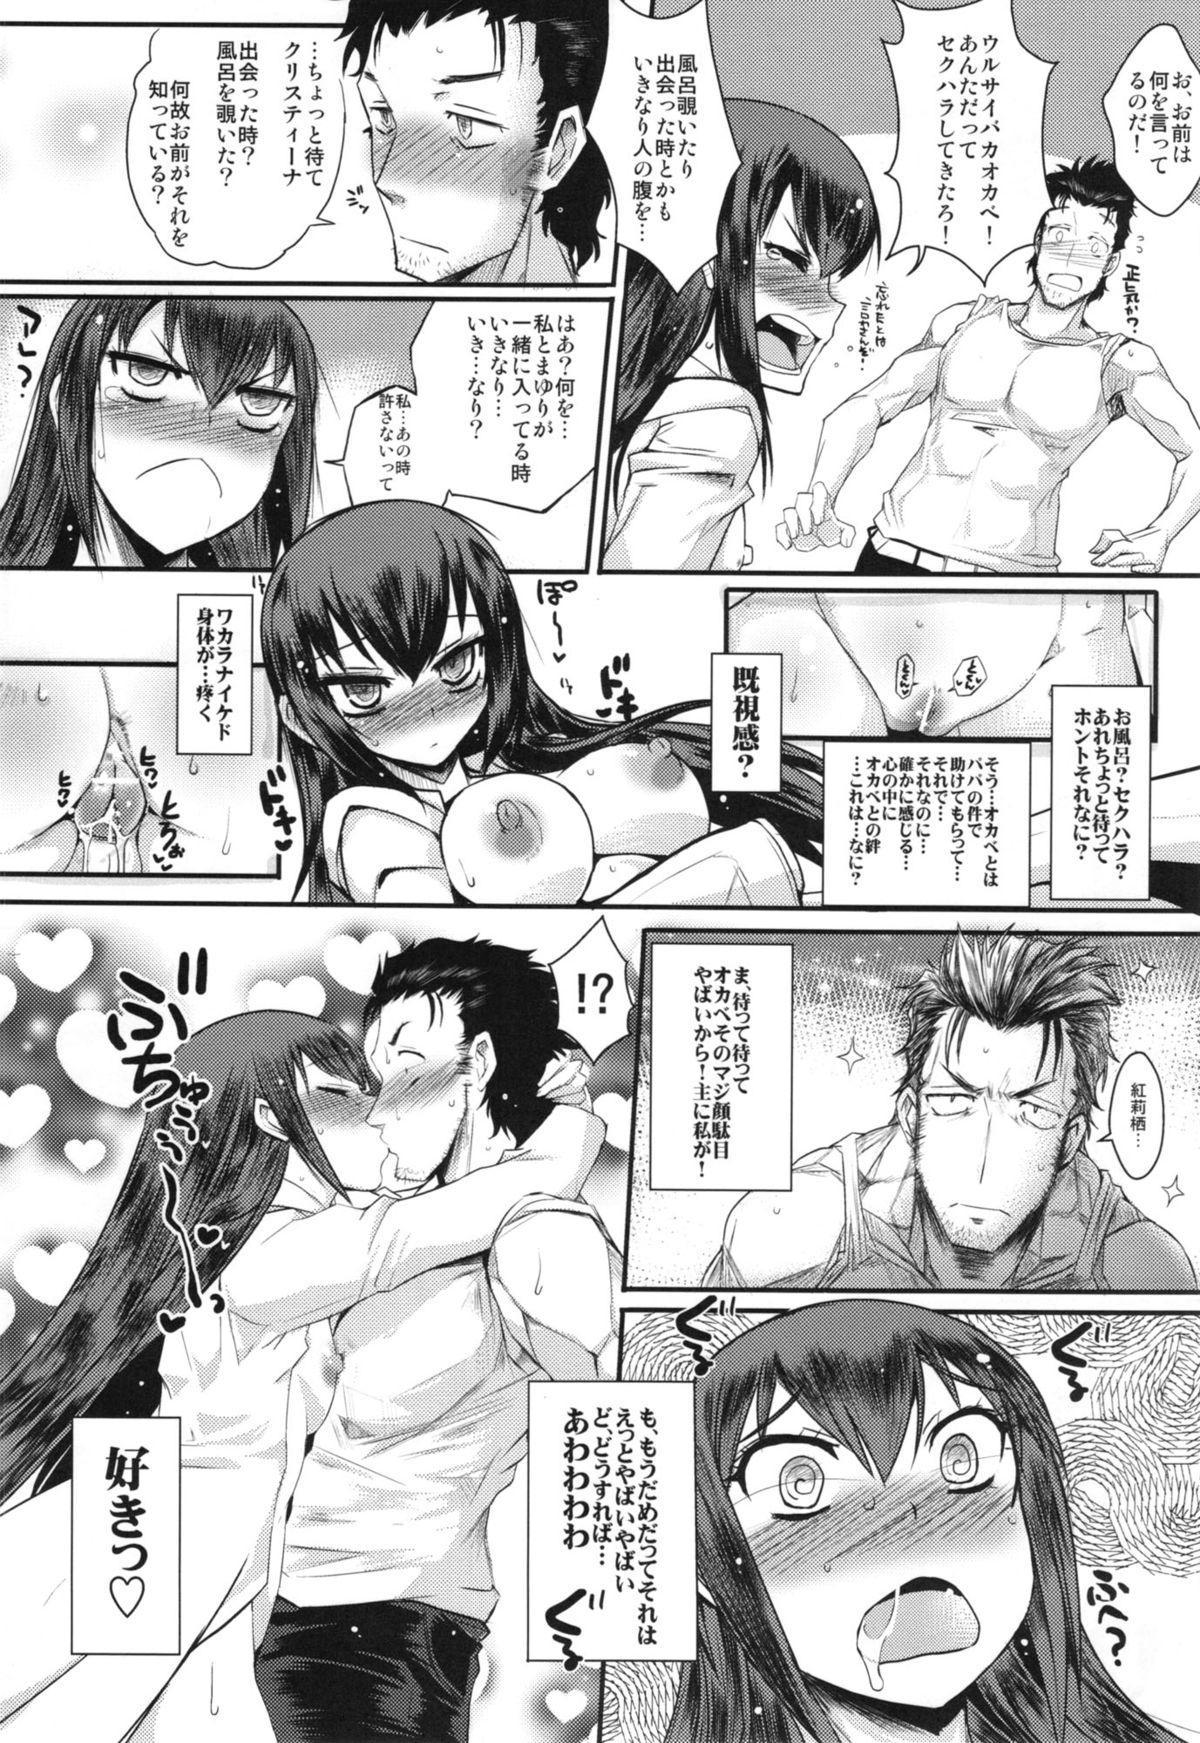 Aiyoku Inbi no Sodominist 9